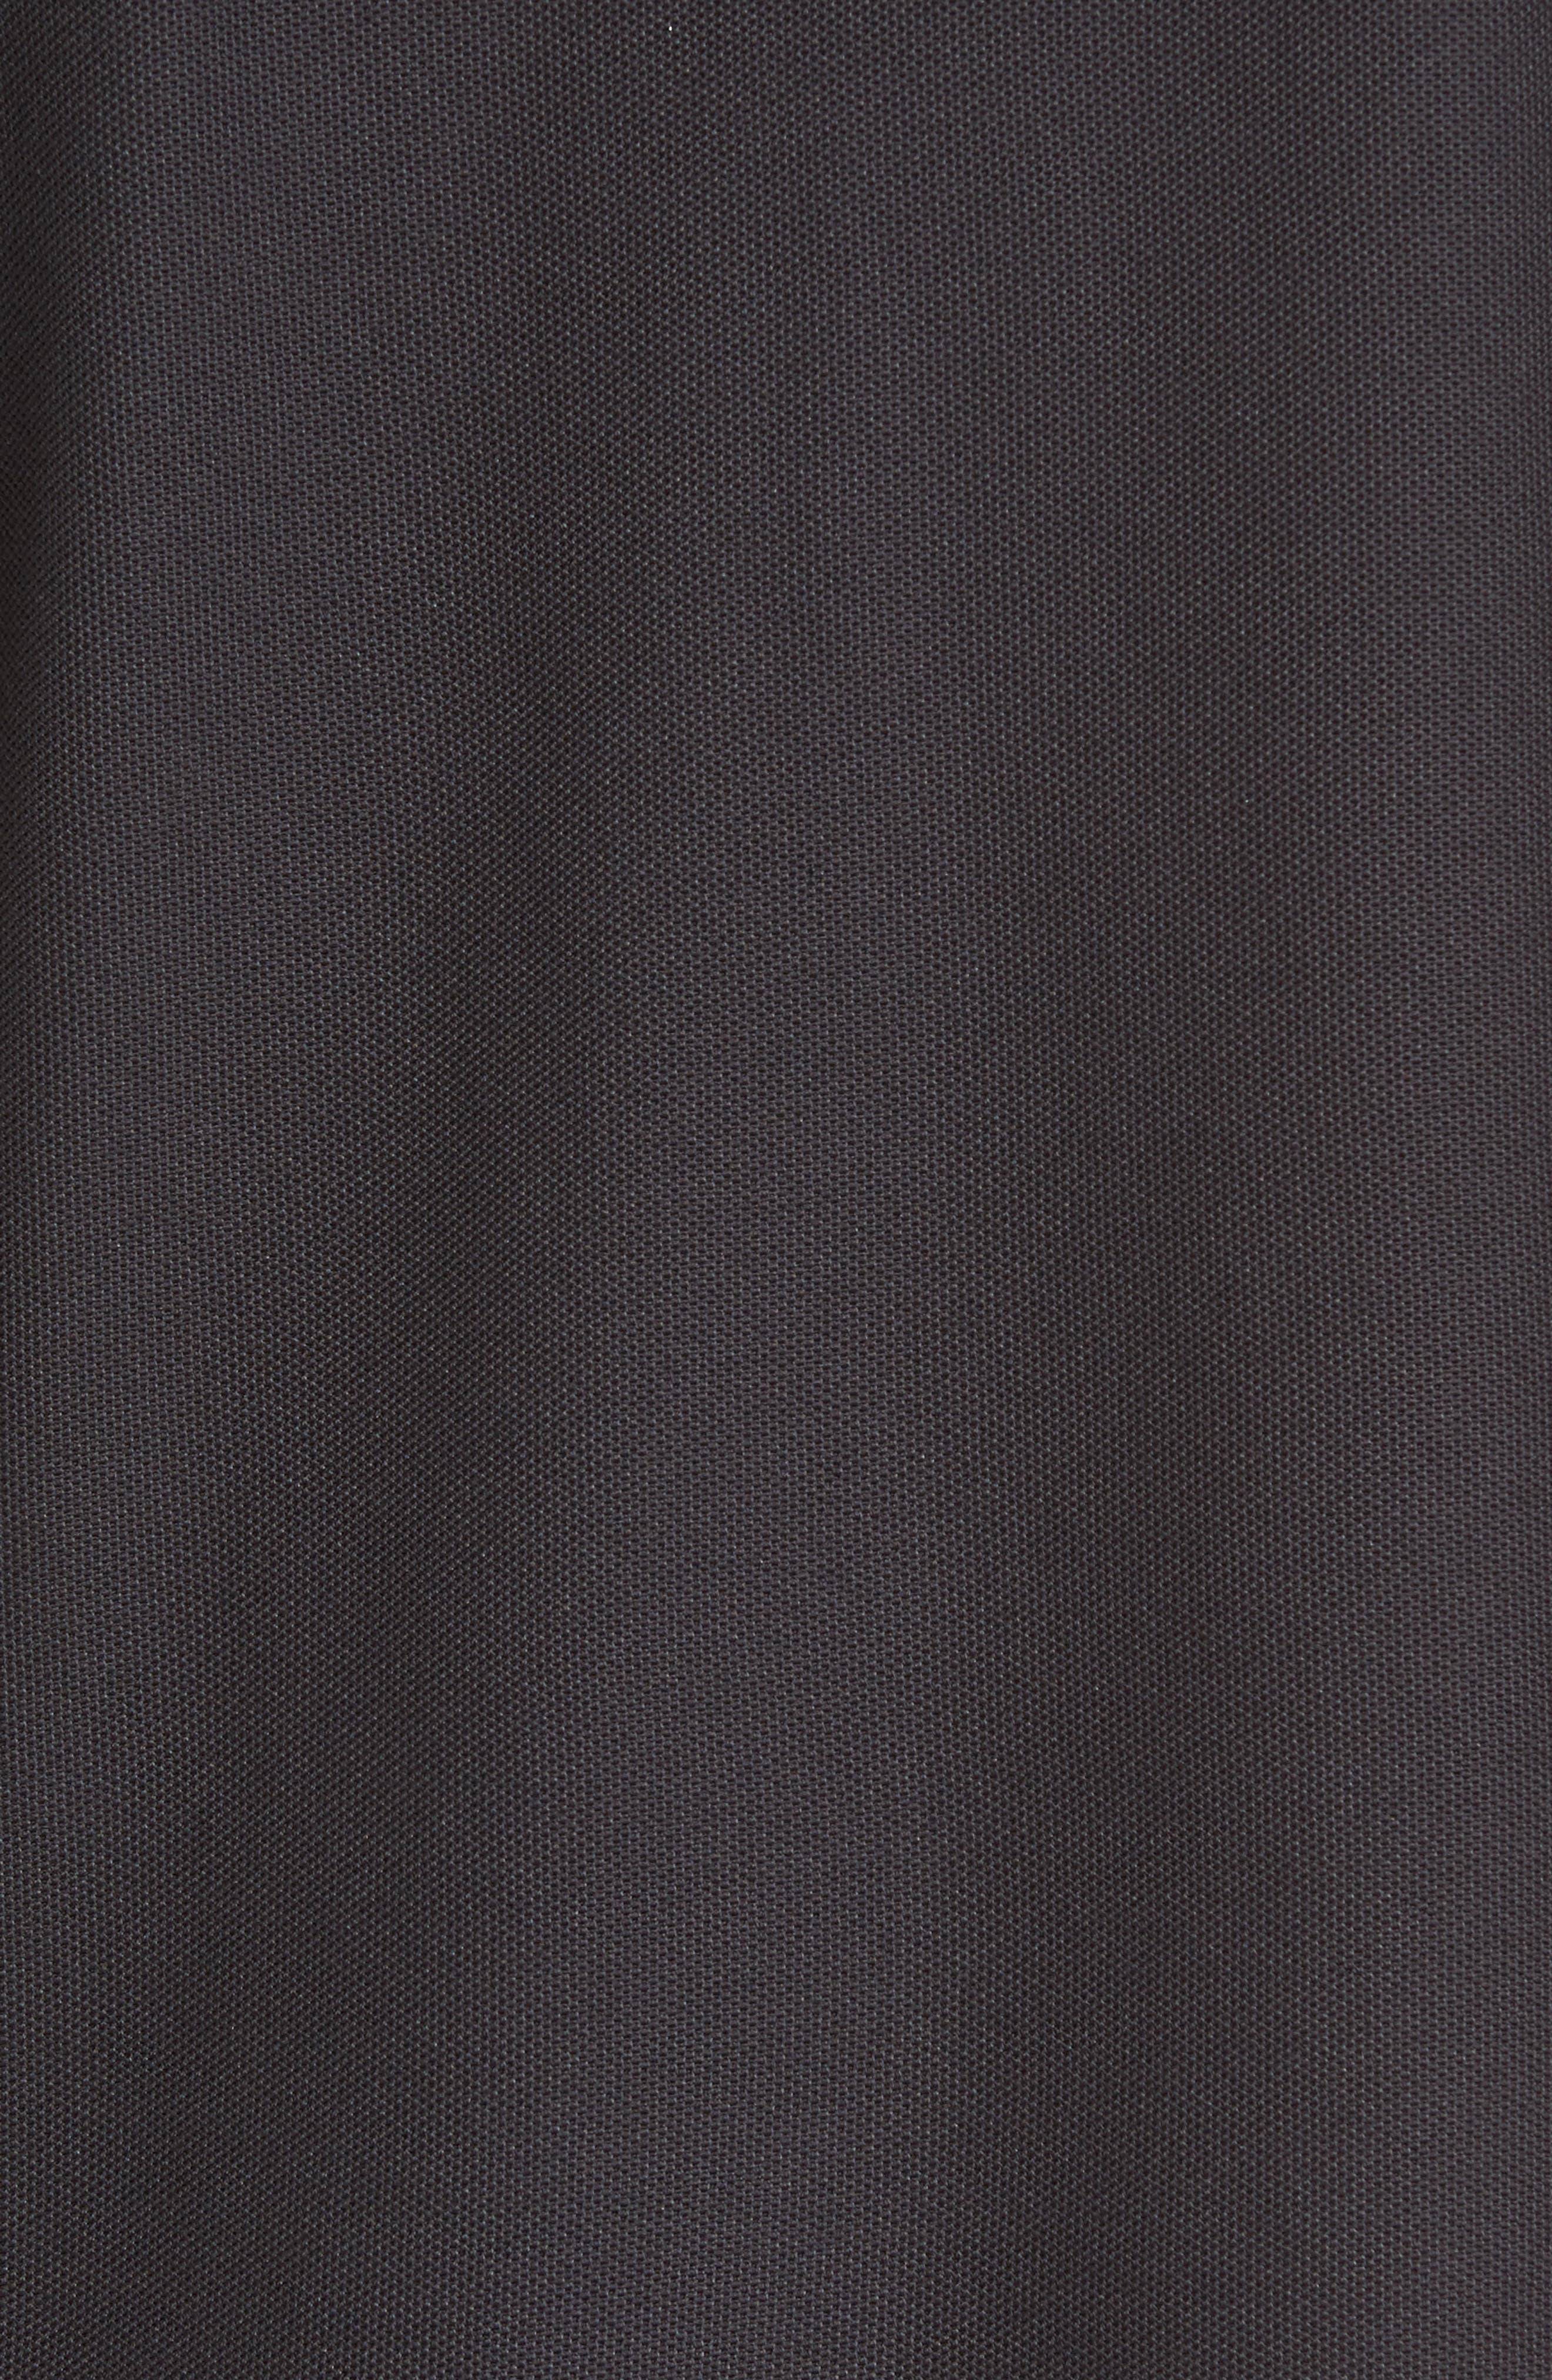 Alternate Image 5  - Tommy Bahama Limited Edition Poinsettia Emfielder Piqué Polo